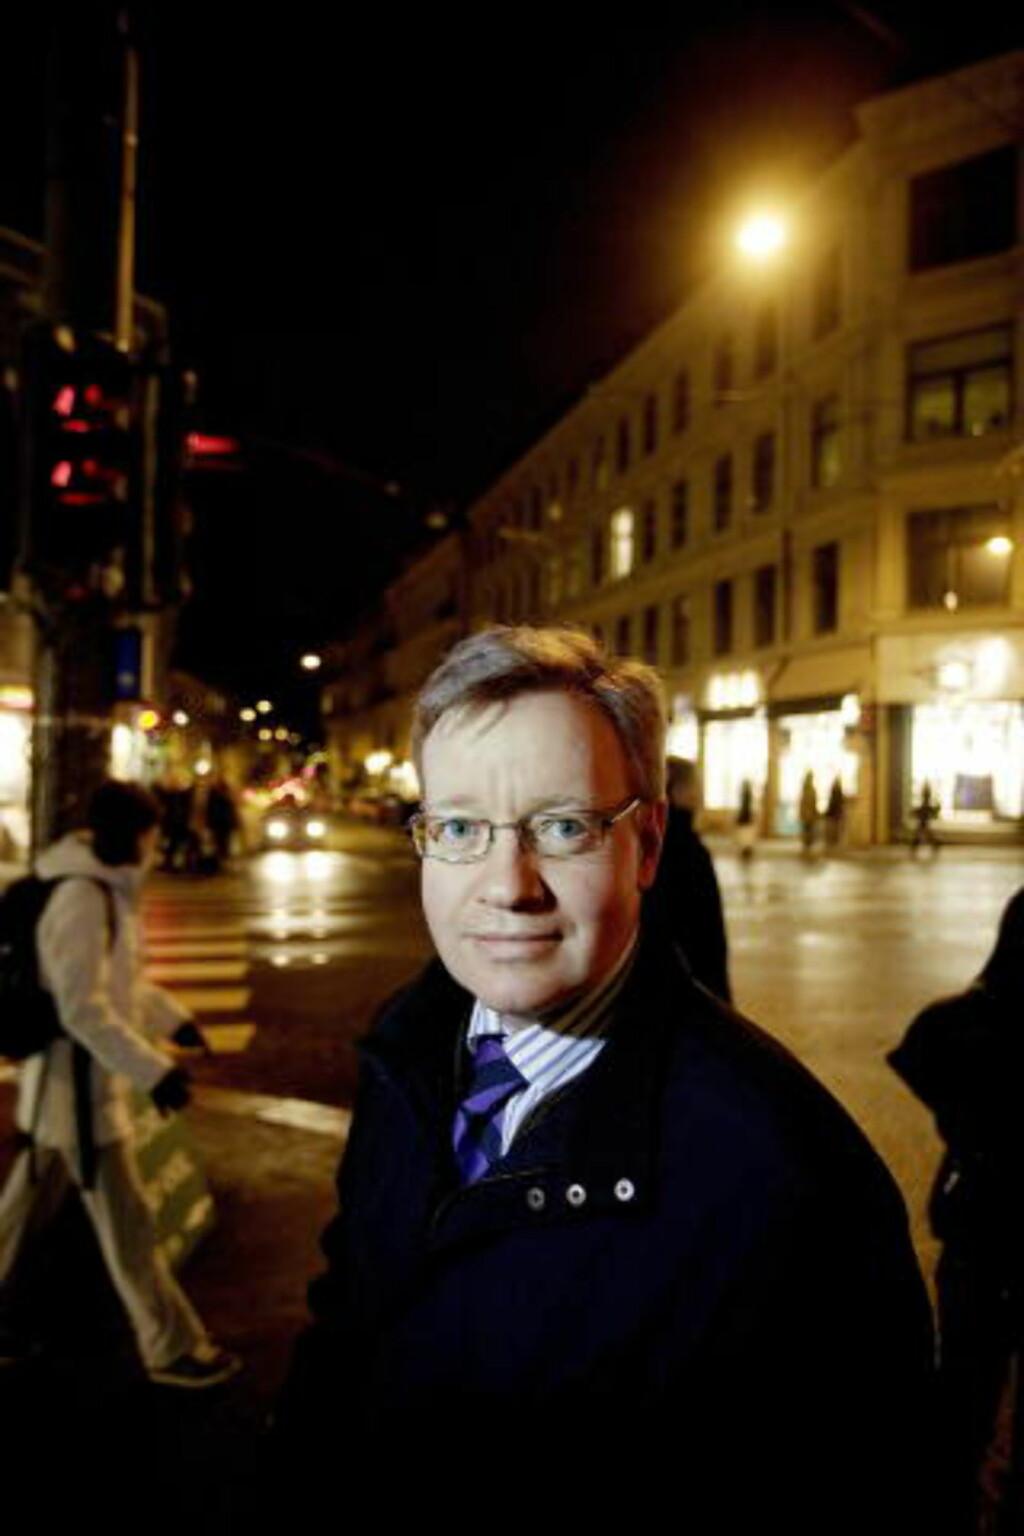 AVVISER JUKSEPÅSTANDER: Oslos skolebyråd Torger Ødegaard avviser juks ved Oslo-skolene. Foto: Torbjørn Grønning/Dagbladet